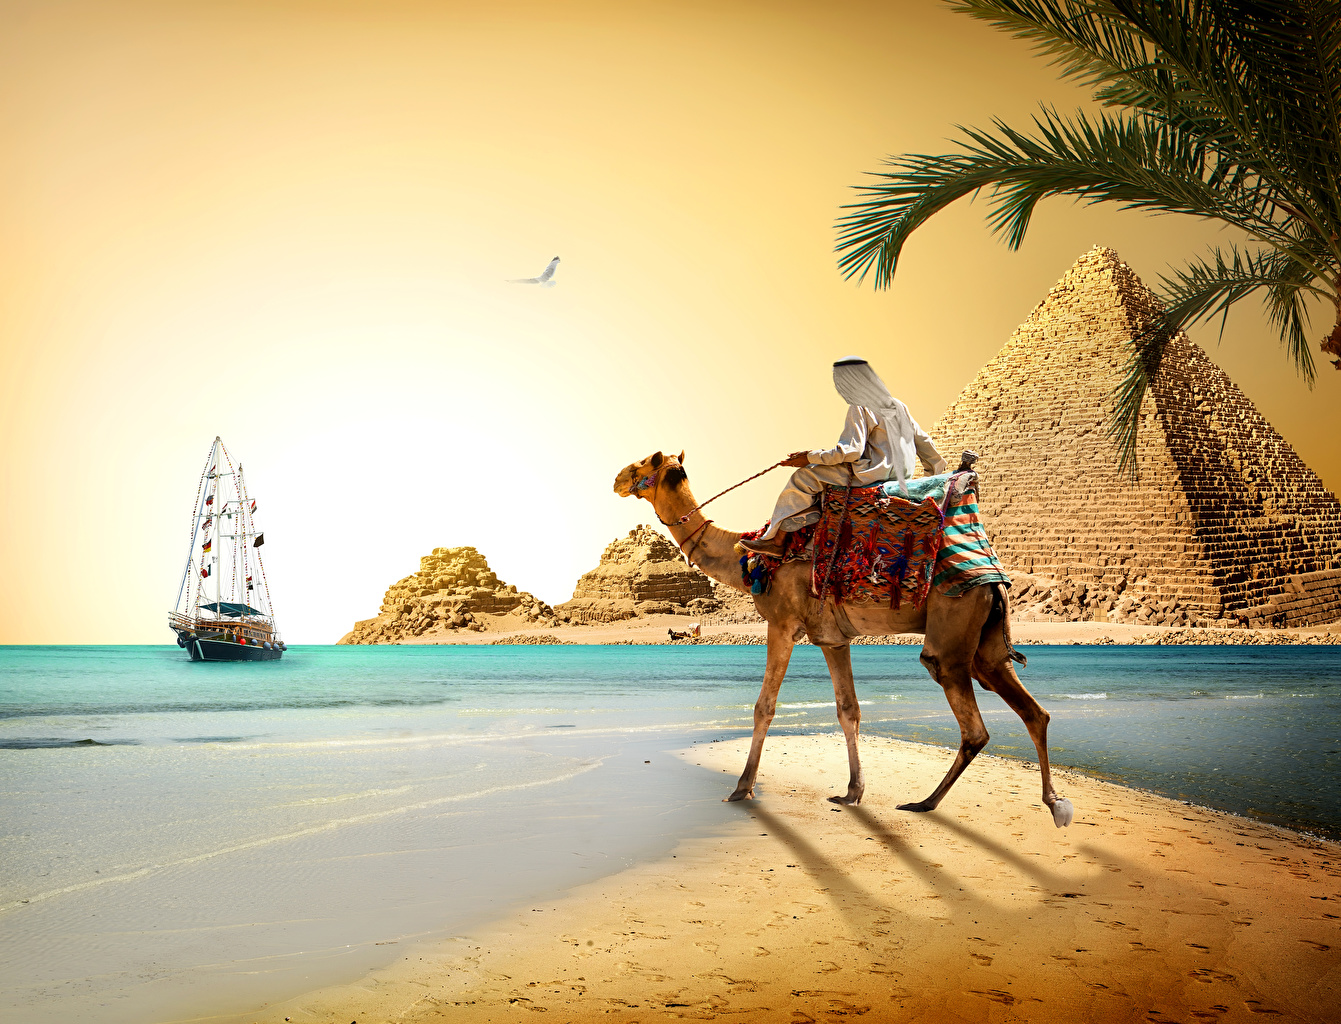 https://s1.1zoom.ru/big0/650/Egypt_Desert_Camels_Coast_Ships_Sailing_Cairo_539248_1341x1024.jpg